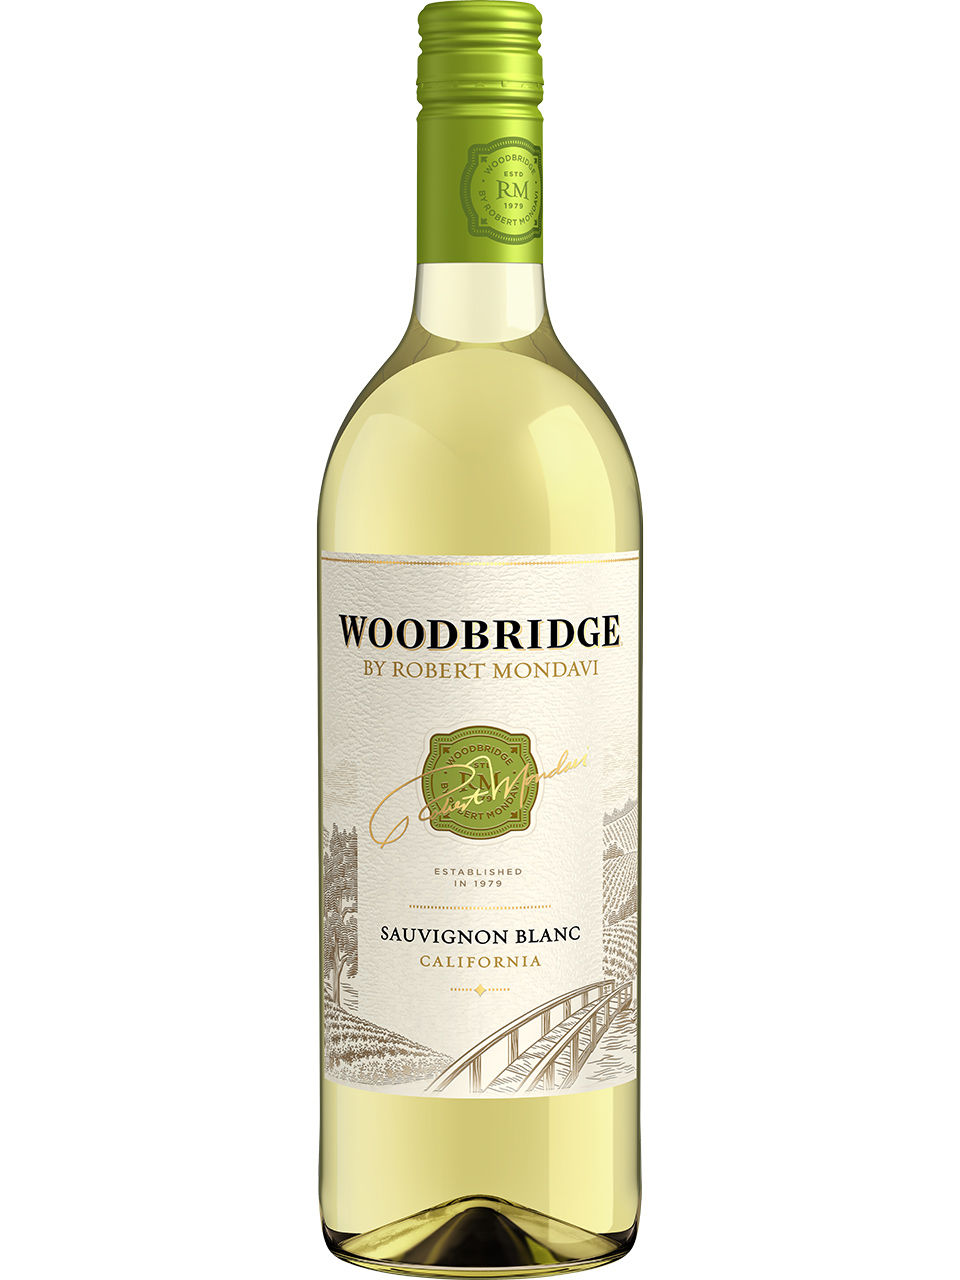 Woodbridge Robert Mondavi Sauvignon Blanc